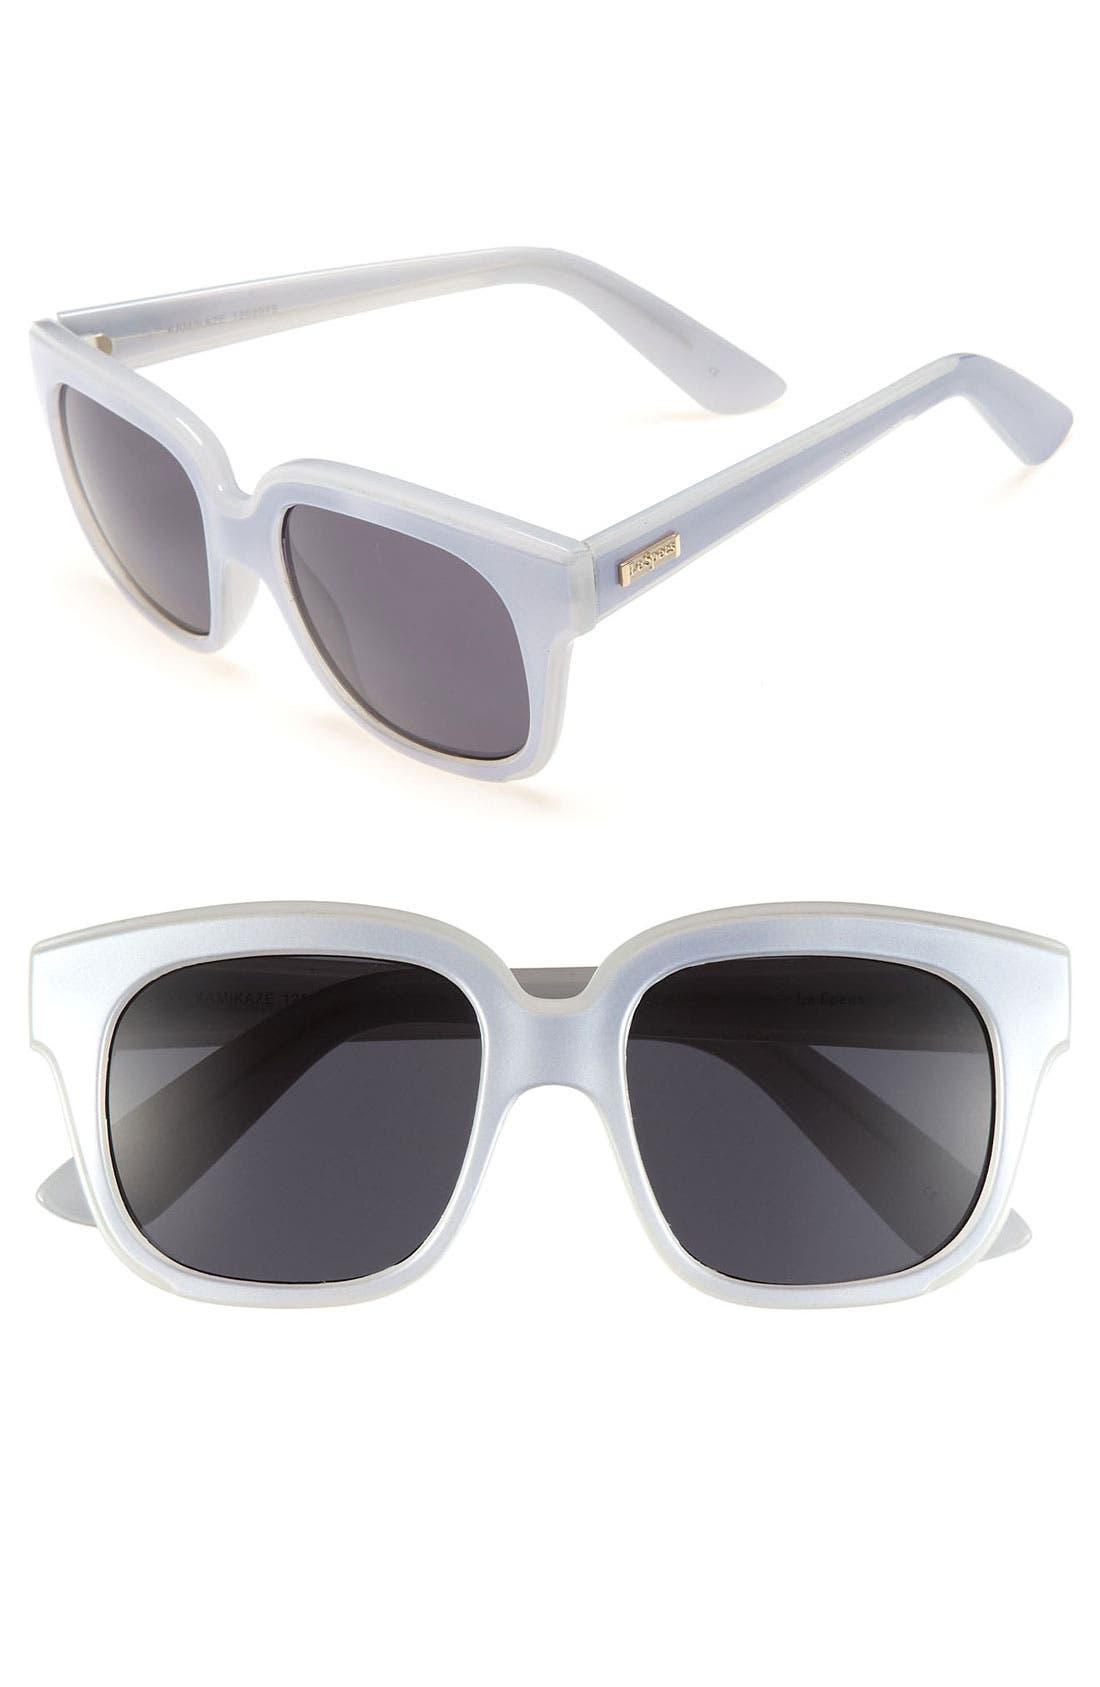 Alternate Image 1 Selected - Le Specs 'Kamikaze' Sunglasses